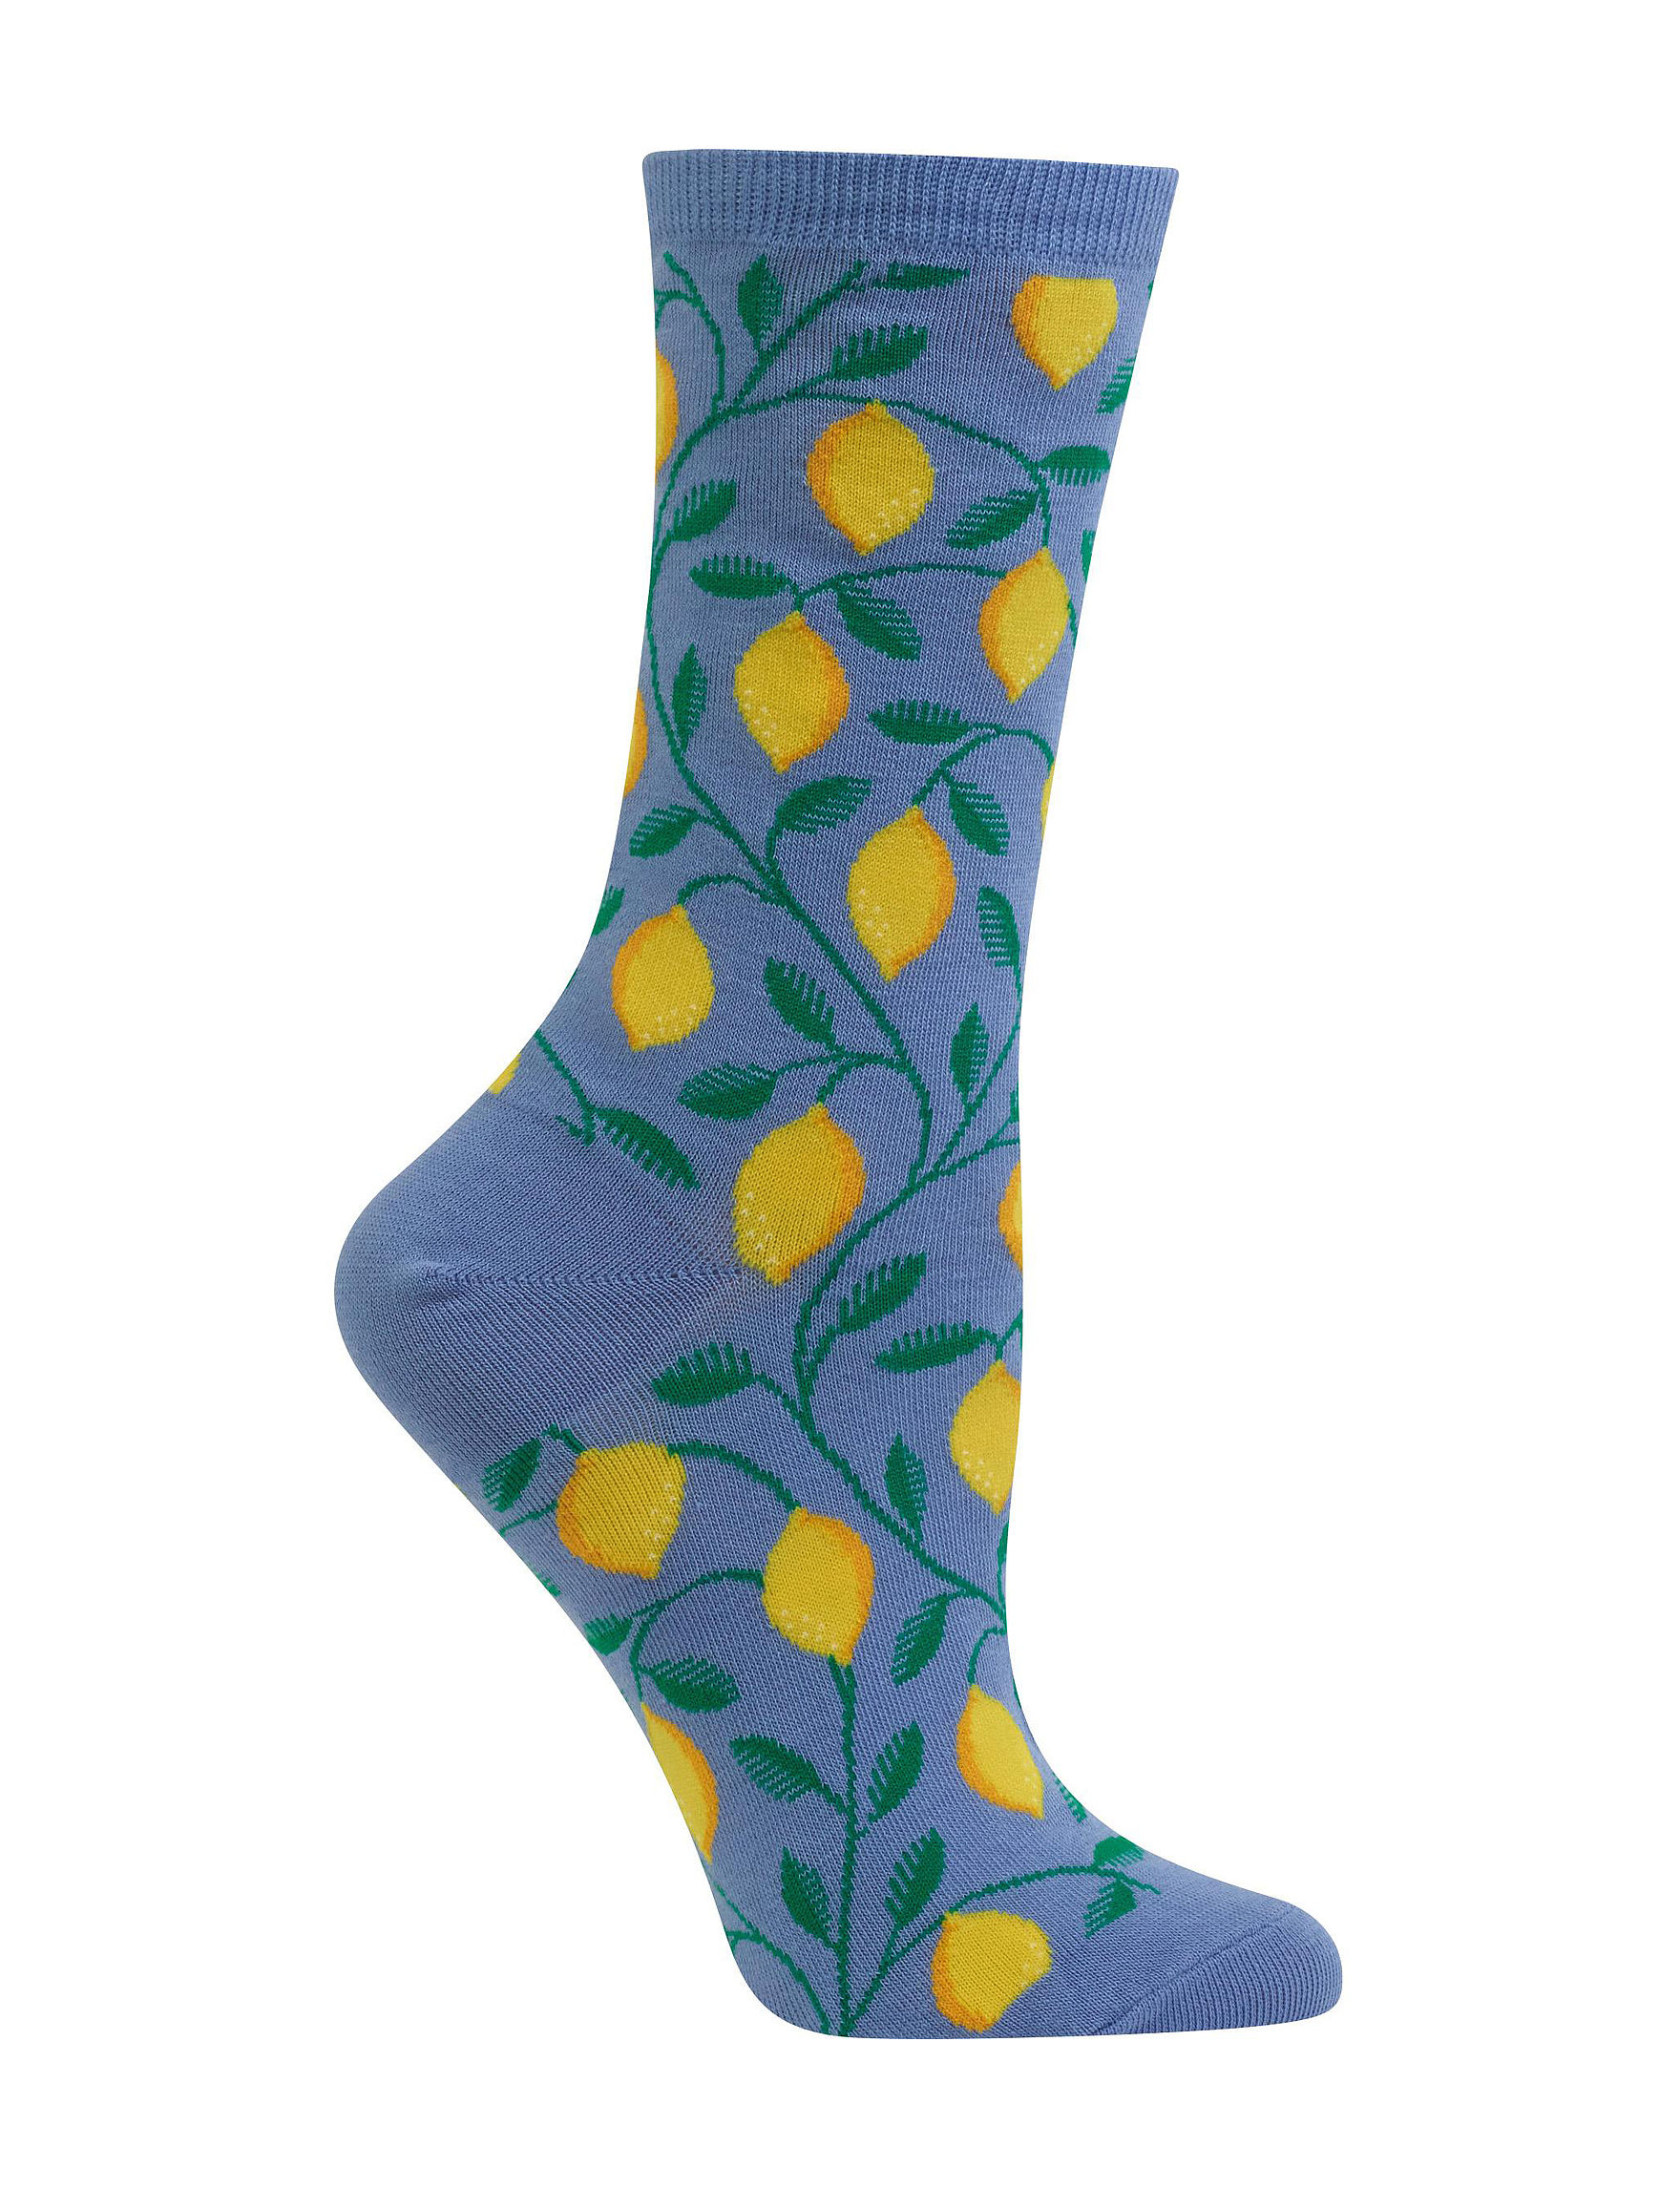 Hot Sox Blue Socks